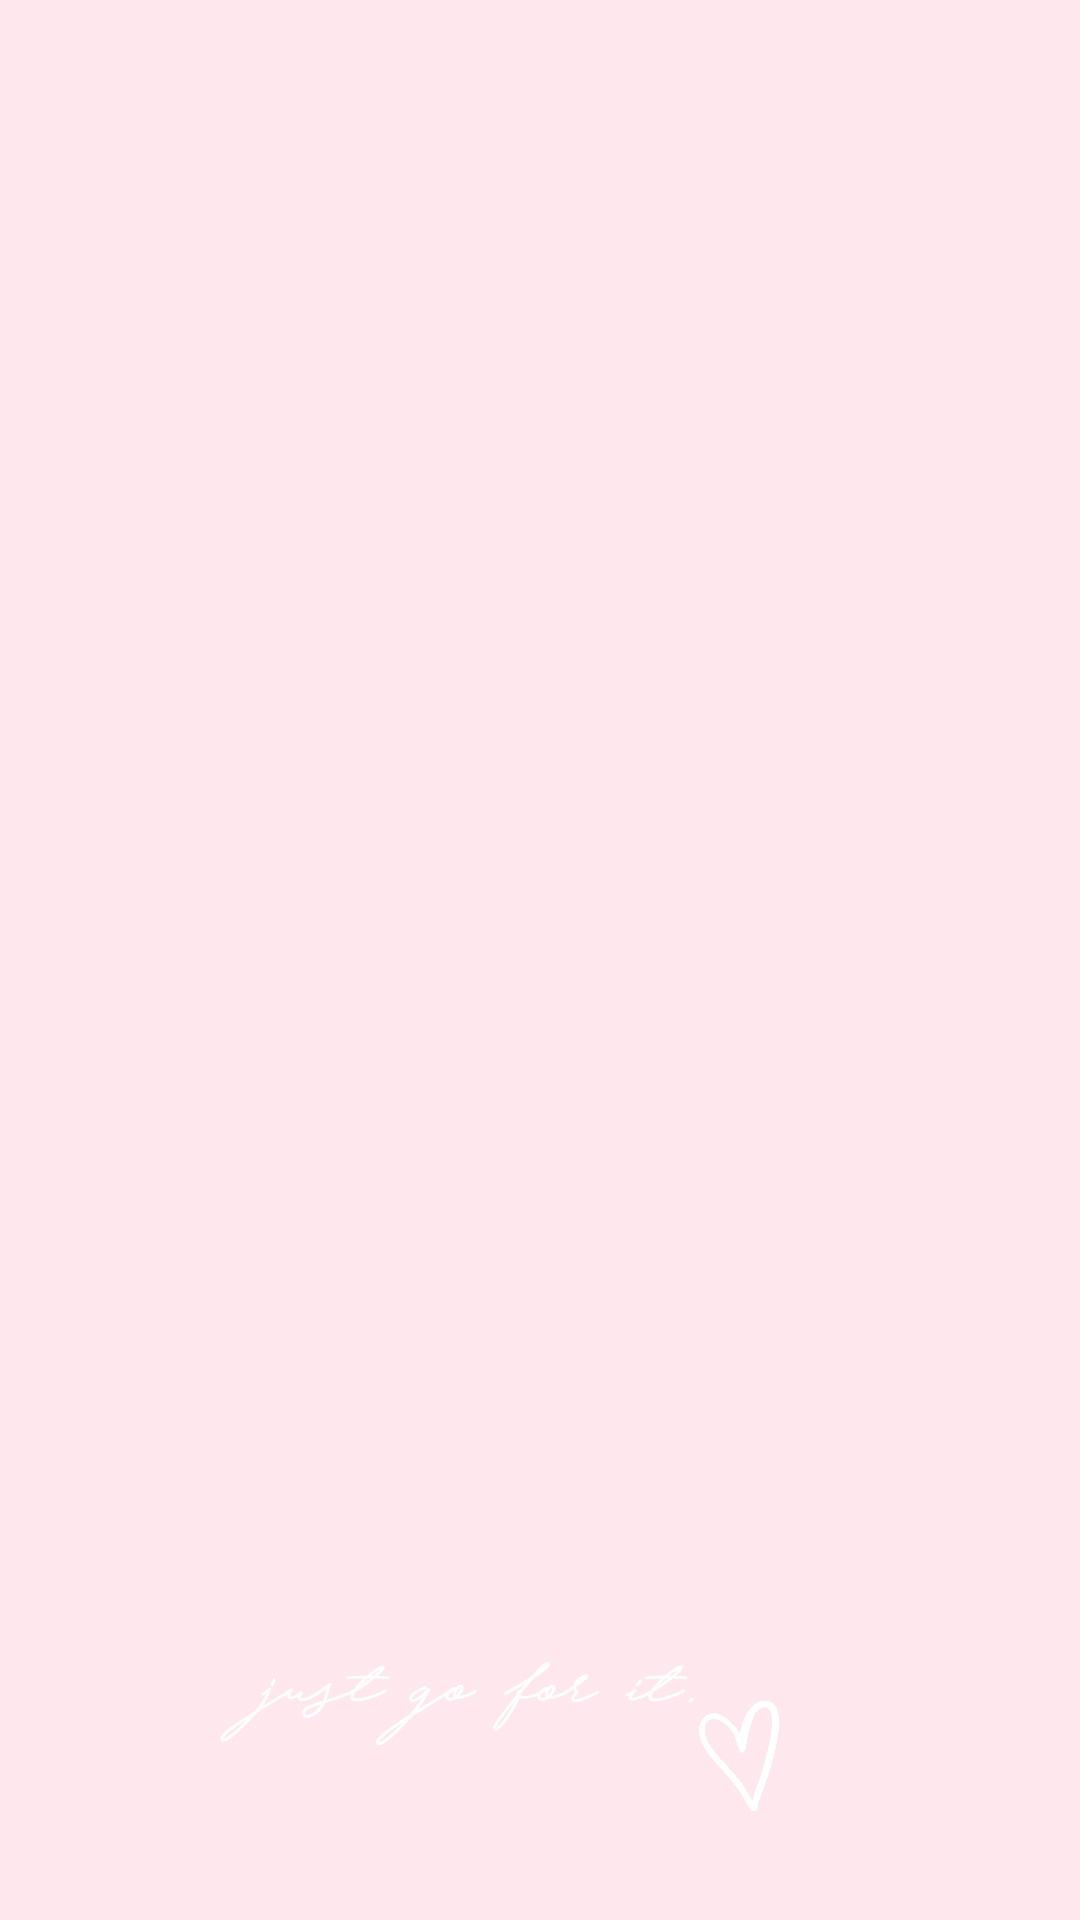 pink wallpaper, iphone wallpaper, phone wallpaper, free pink wallpaper, free iphone wallpaper, motivational wallpaper, phone wallpaper quotes, pink iphone background, iphone background, pink iphone wallpaper pastel, pastel iphone wallpaper, inspirational wallpaper, free iphone wallpapers, friends phone wallpapers, blair waldorf phone wallpapers, gossip girl phone wallpapers, motivational phone wallpapers